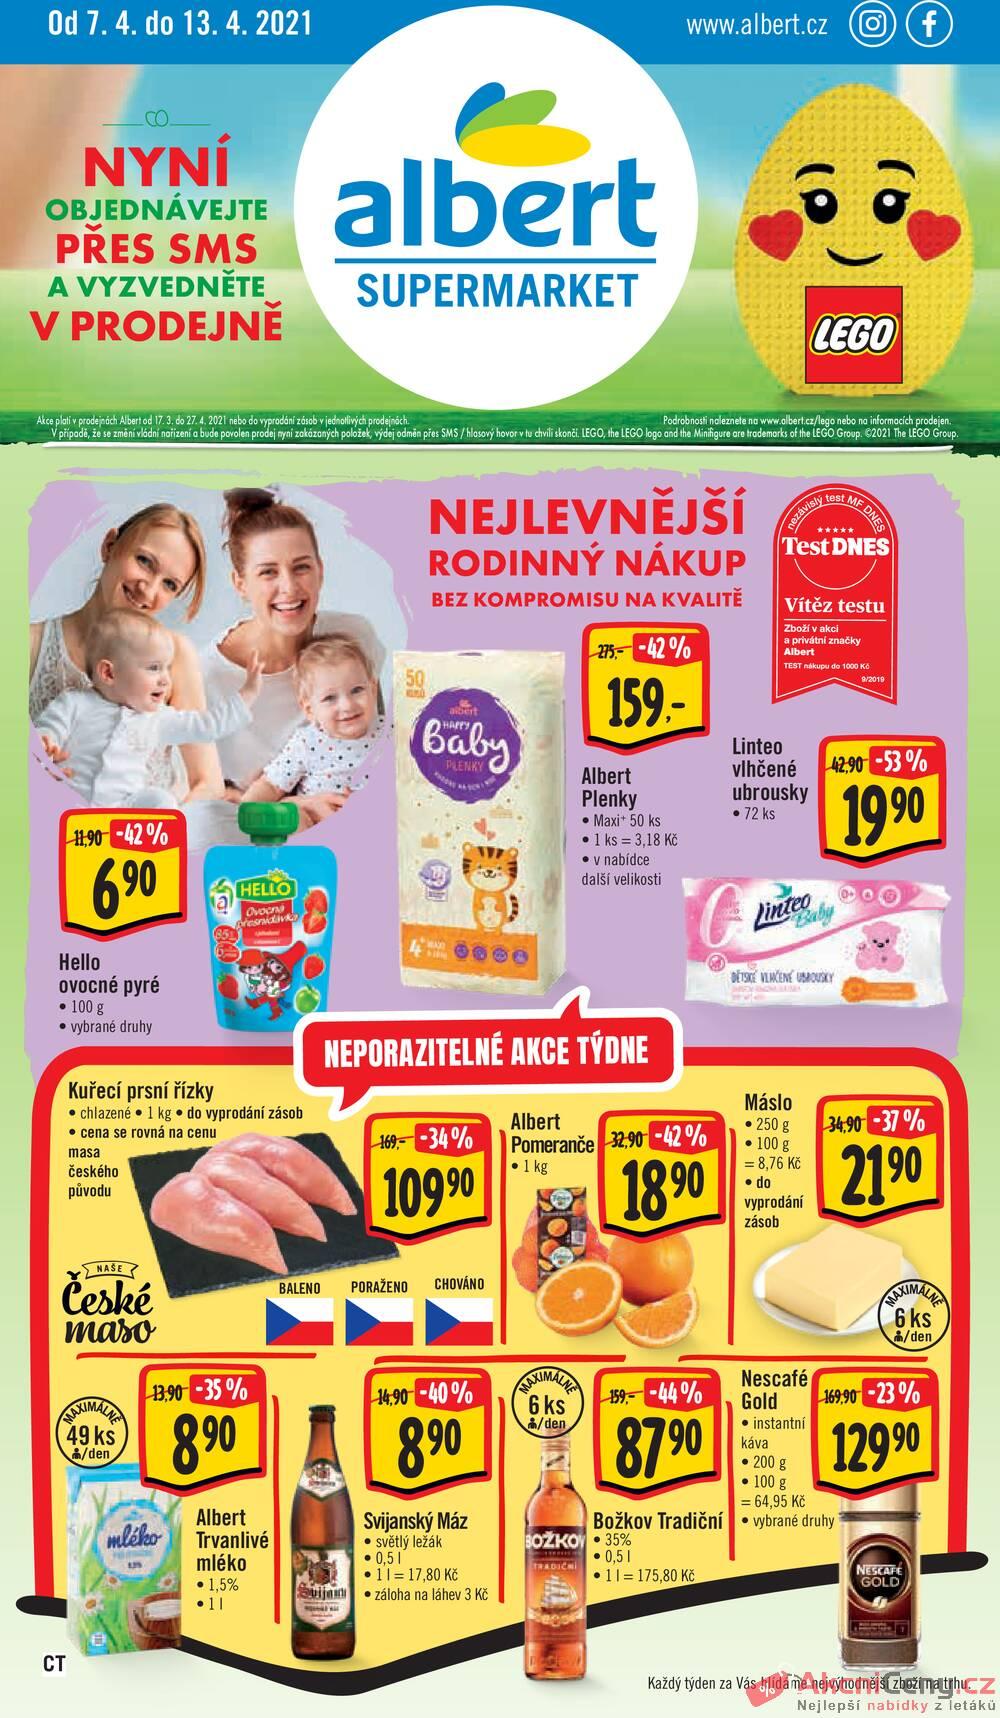 Leták Albert - Albert Supermarket CITY od 7.4. do 13.4.2021 - strana 1